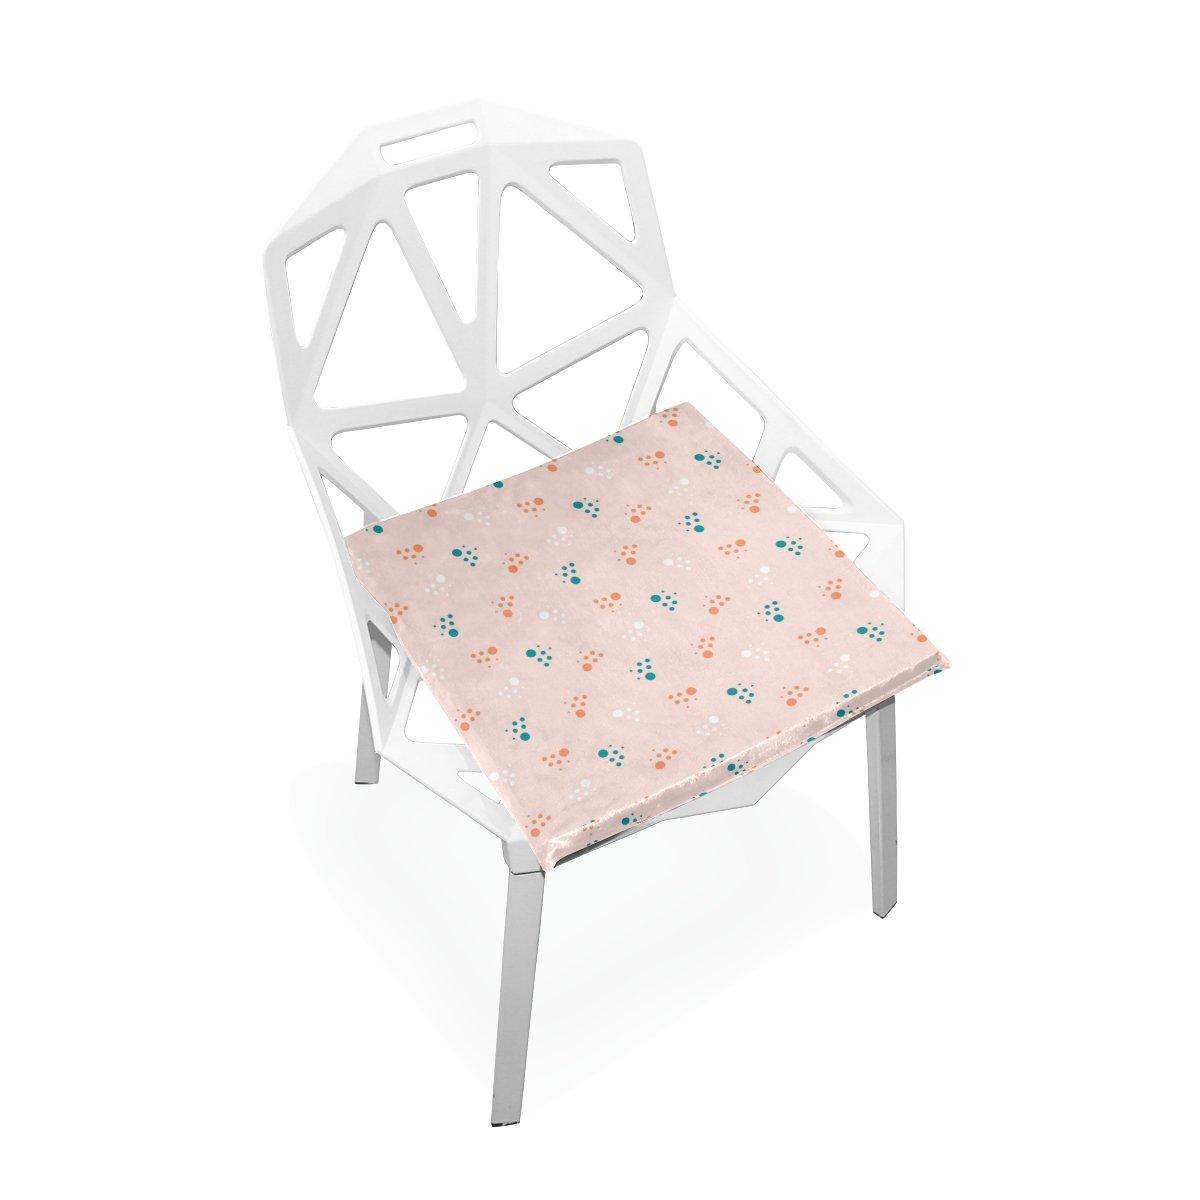 Amazon com xinxin seat cushion pink feet cushions soft chair pad nonslip chair pads cushions home decor for patio furniture dining room 16 x 16 garden